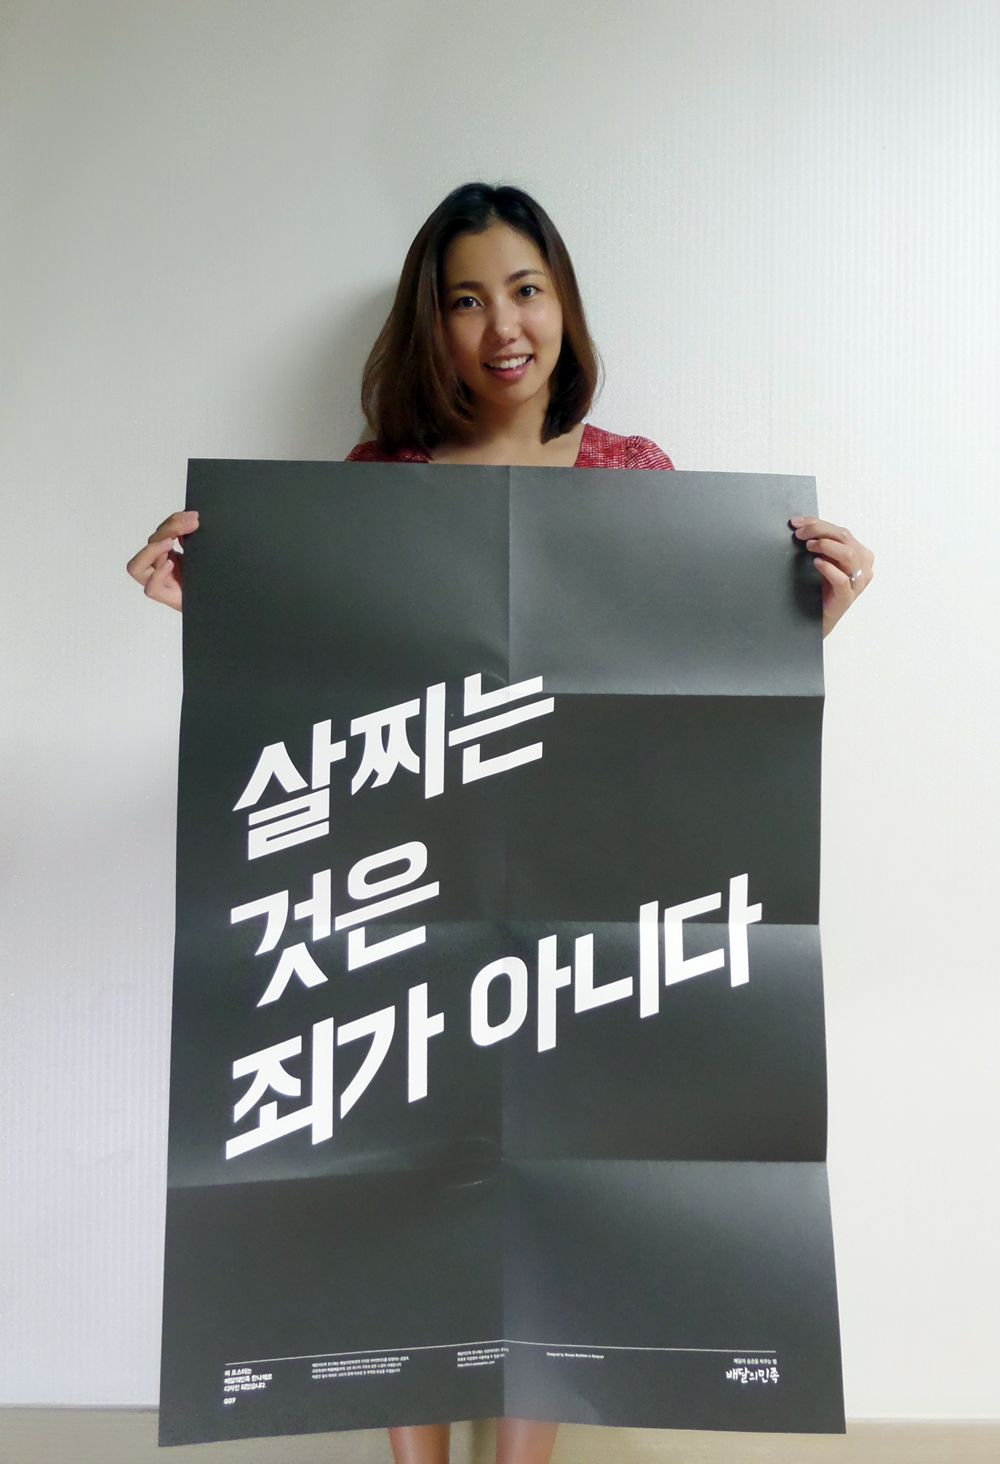 Korean Poster - 살찌는 것은 죄가 아니다 (Gaining weight is not a sin) | Hey Eonni